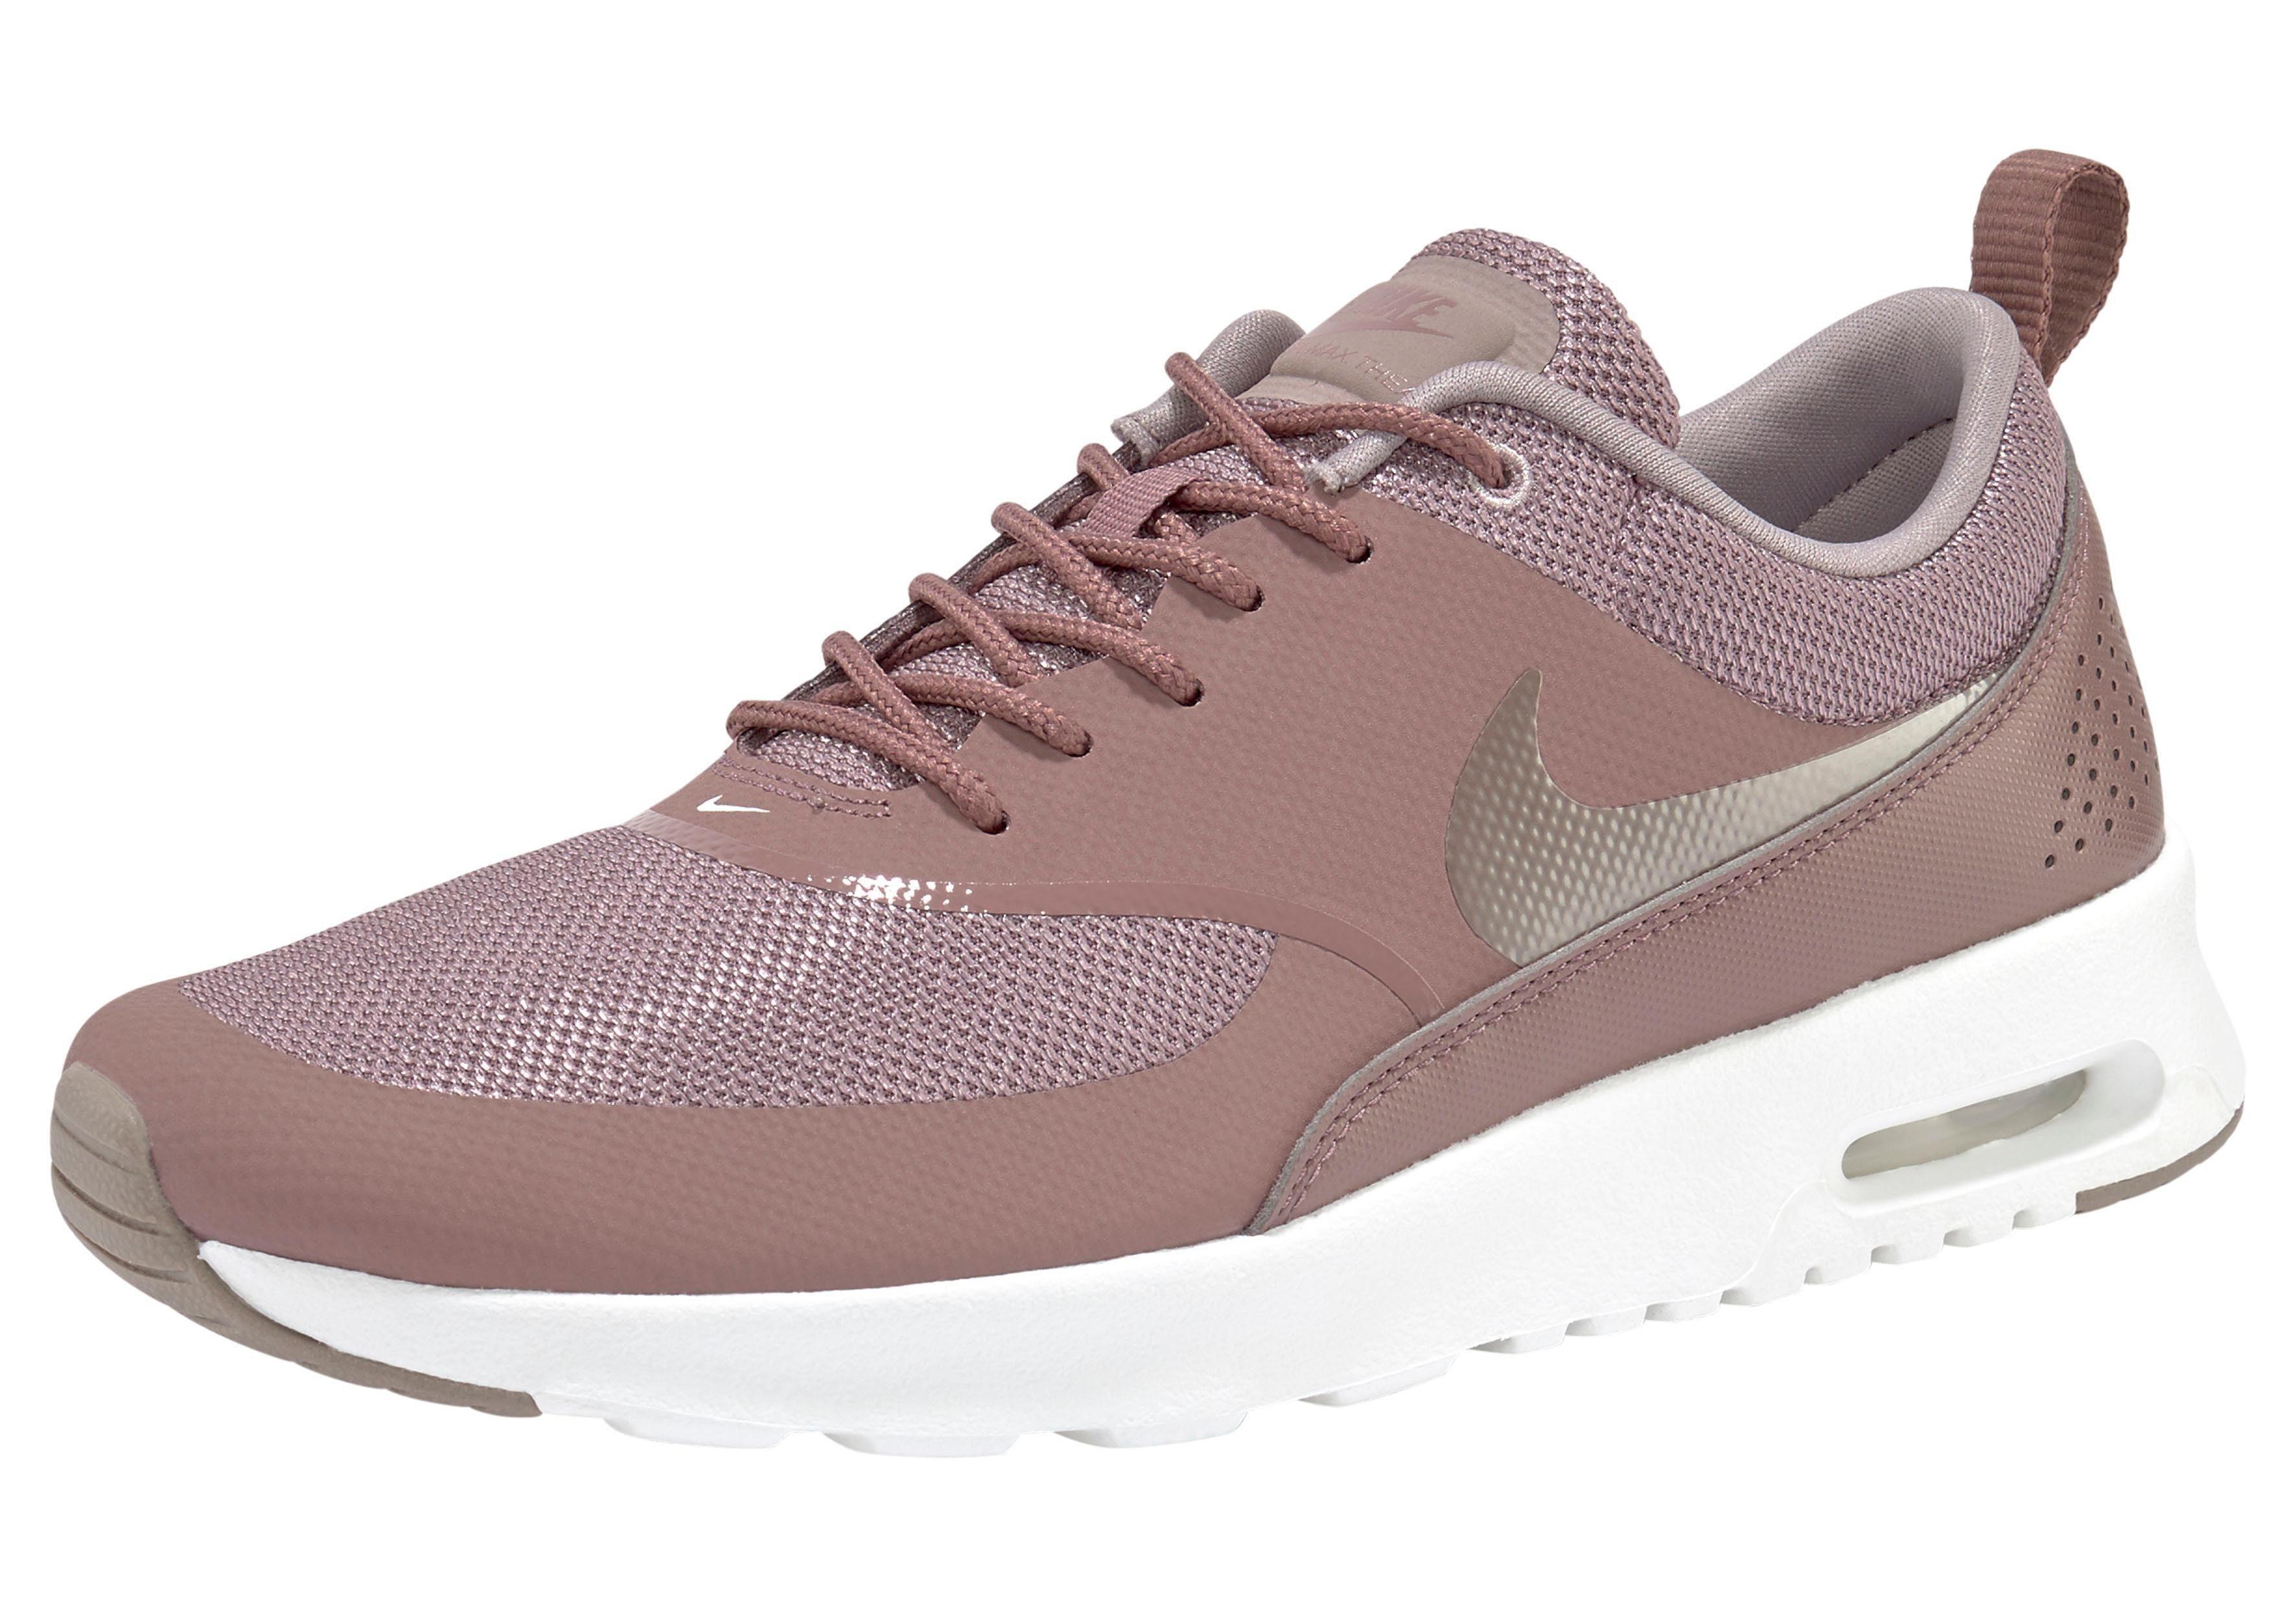 Nike Sportswear »Air Max Thea« Sneaker, Moderner Sneaker von Nike Sportswear online kaufen | OTTO